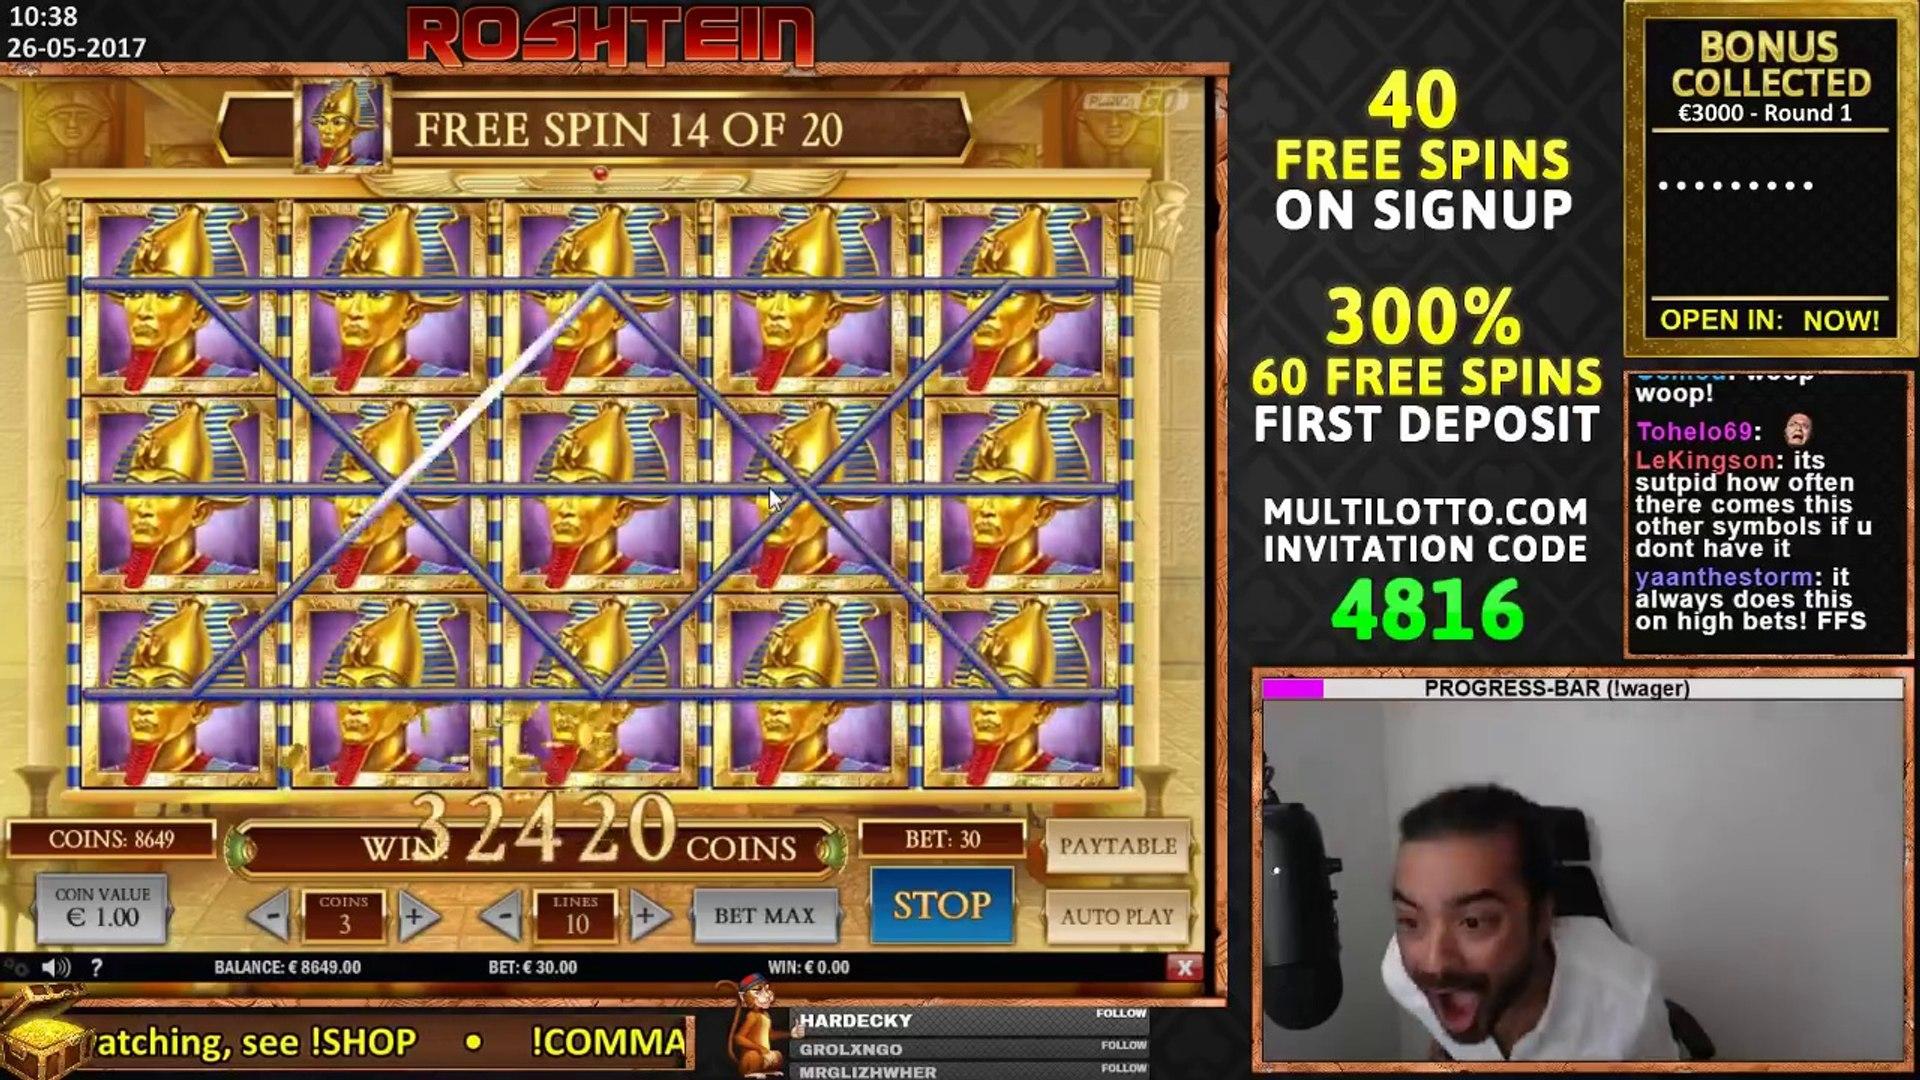 Besten online blackjack spiele